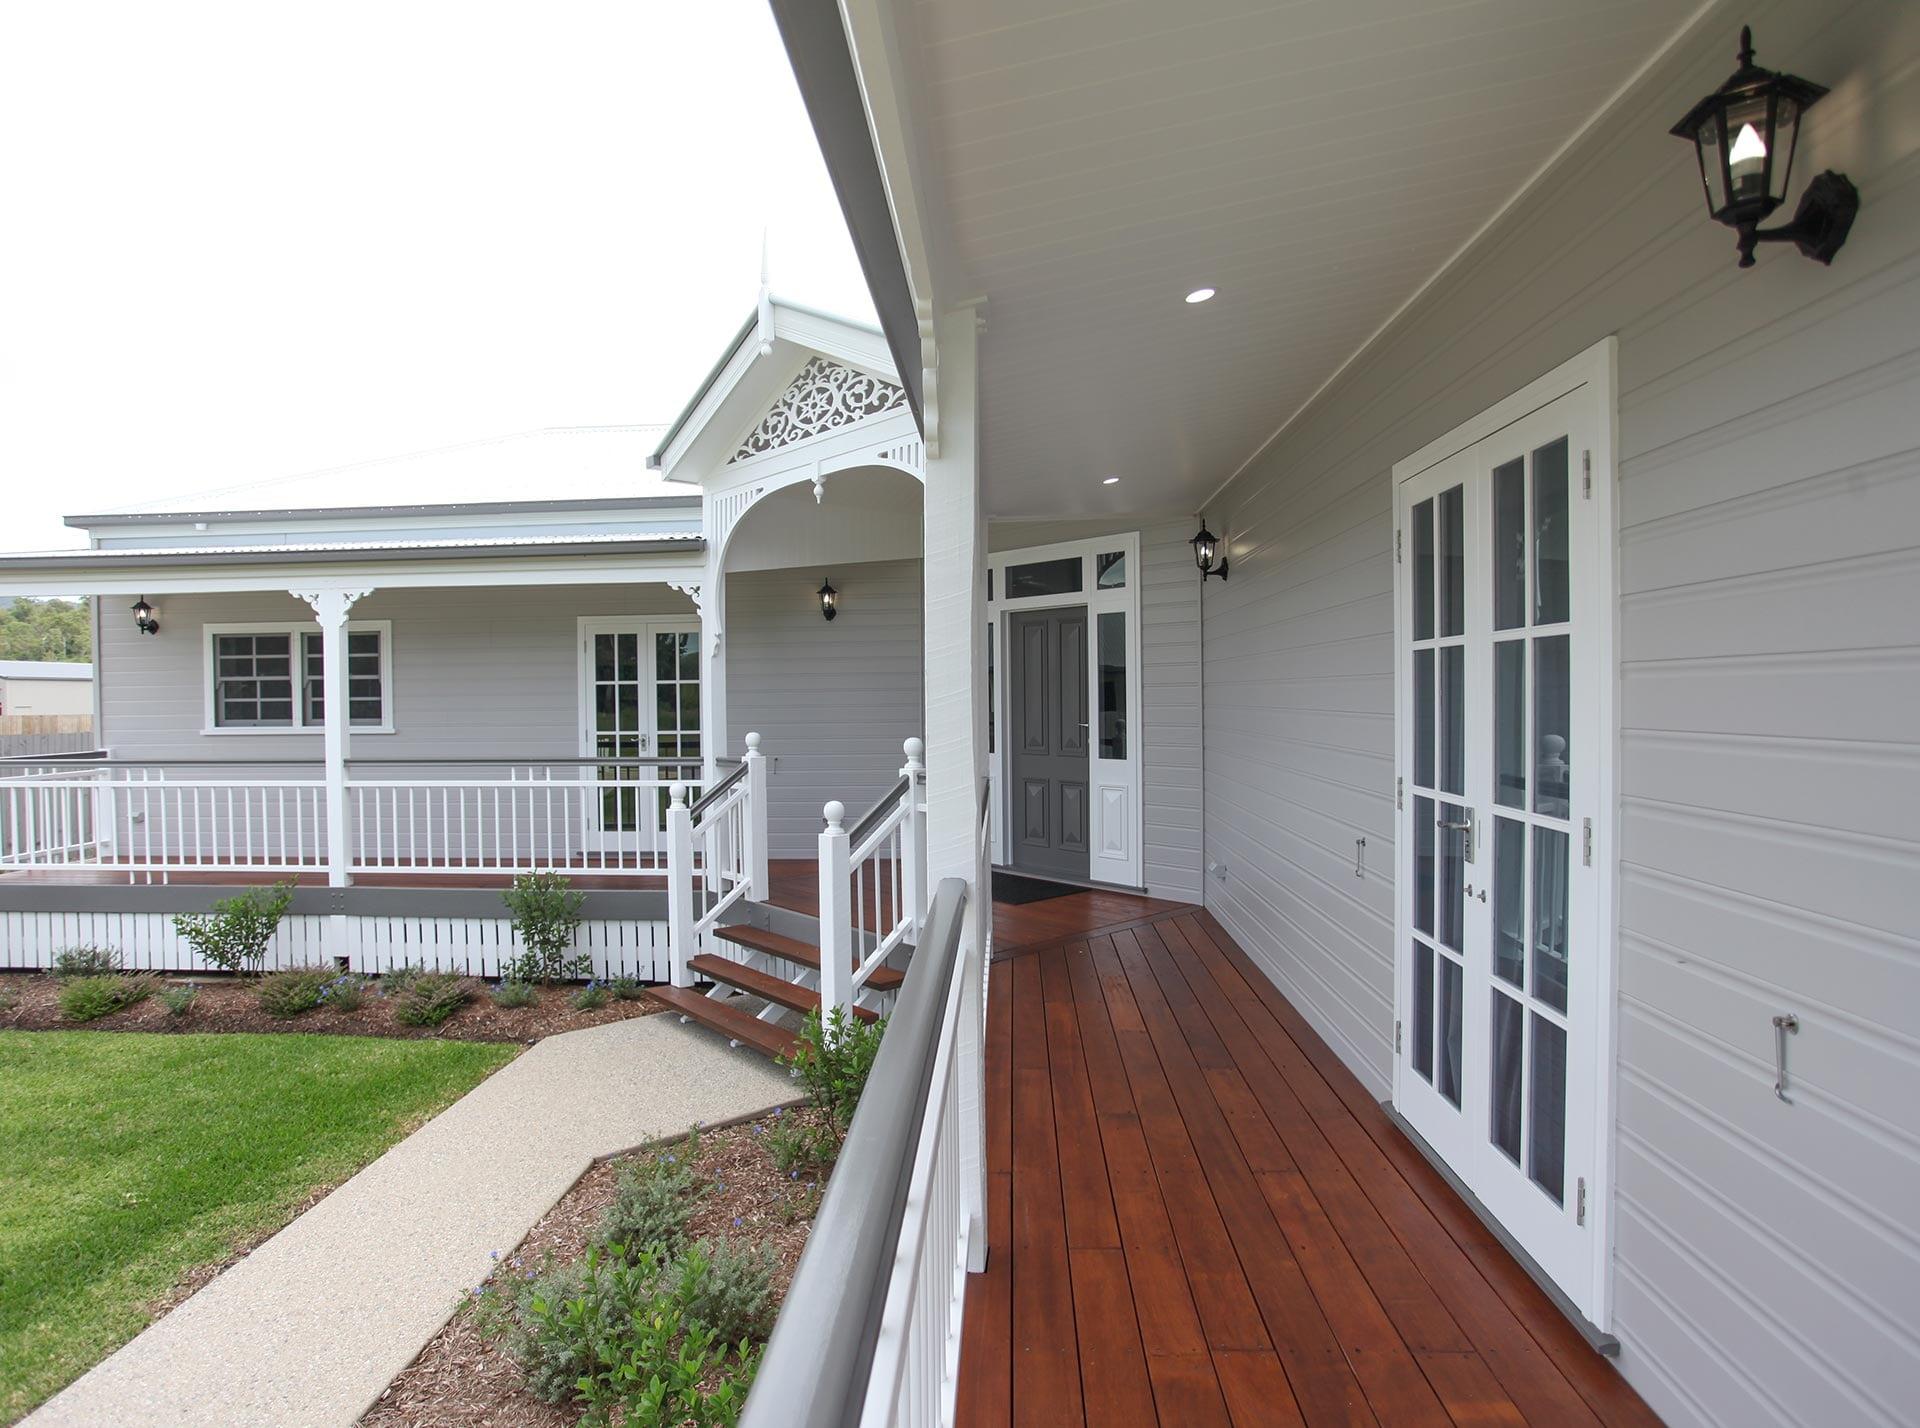 Beames verandah